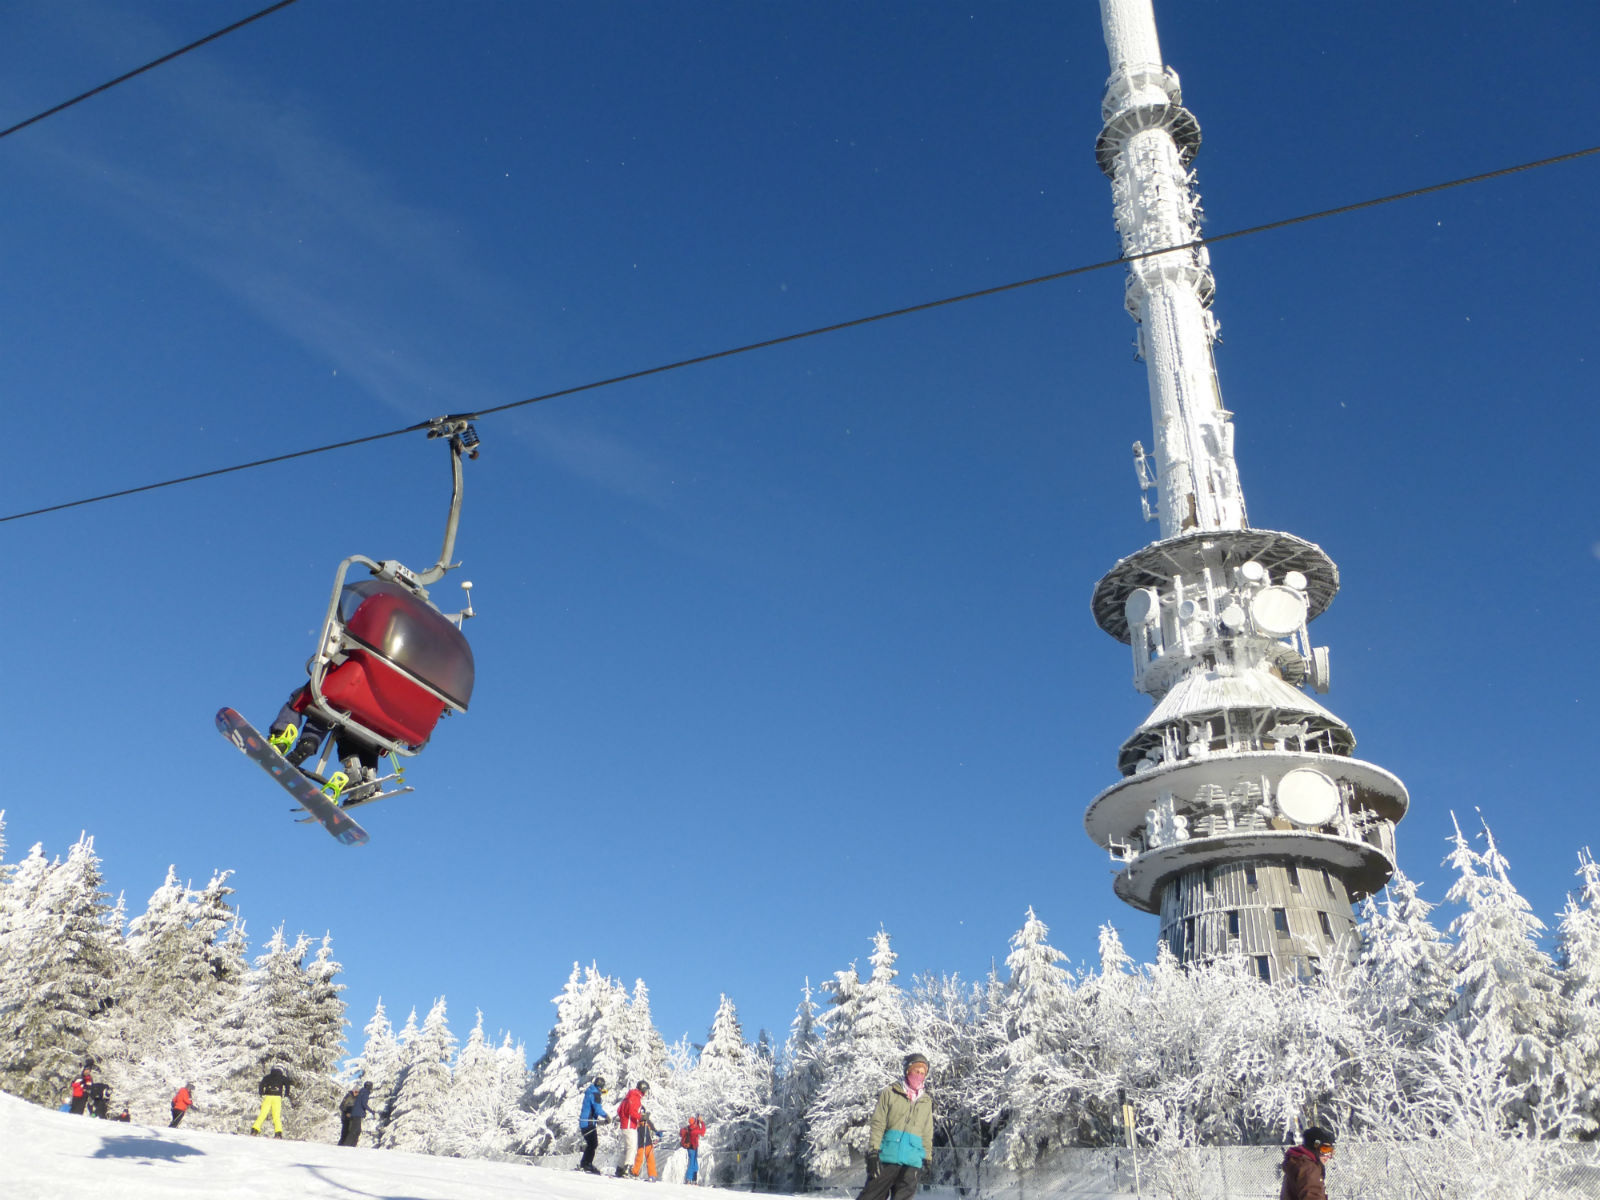 Fichtelgebirge-Seilbahn-Wintersport-Skifahren-Ochsenkopf